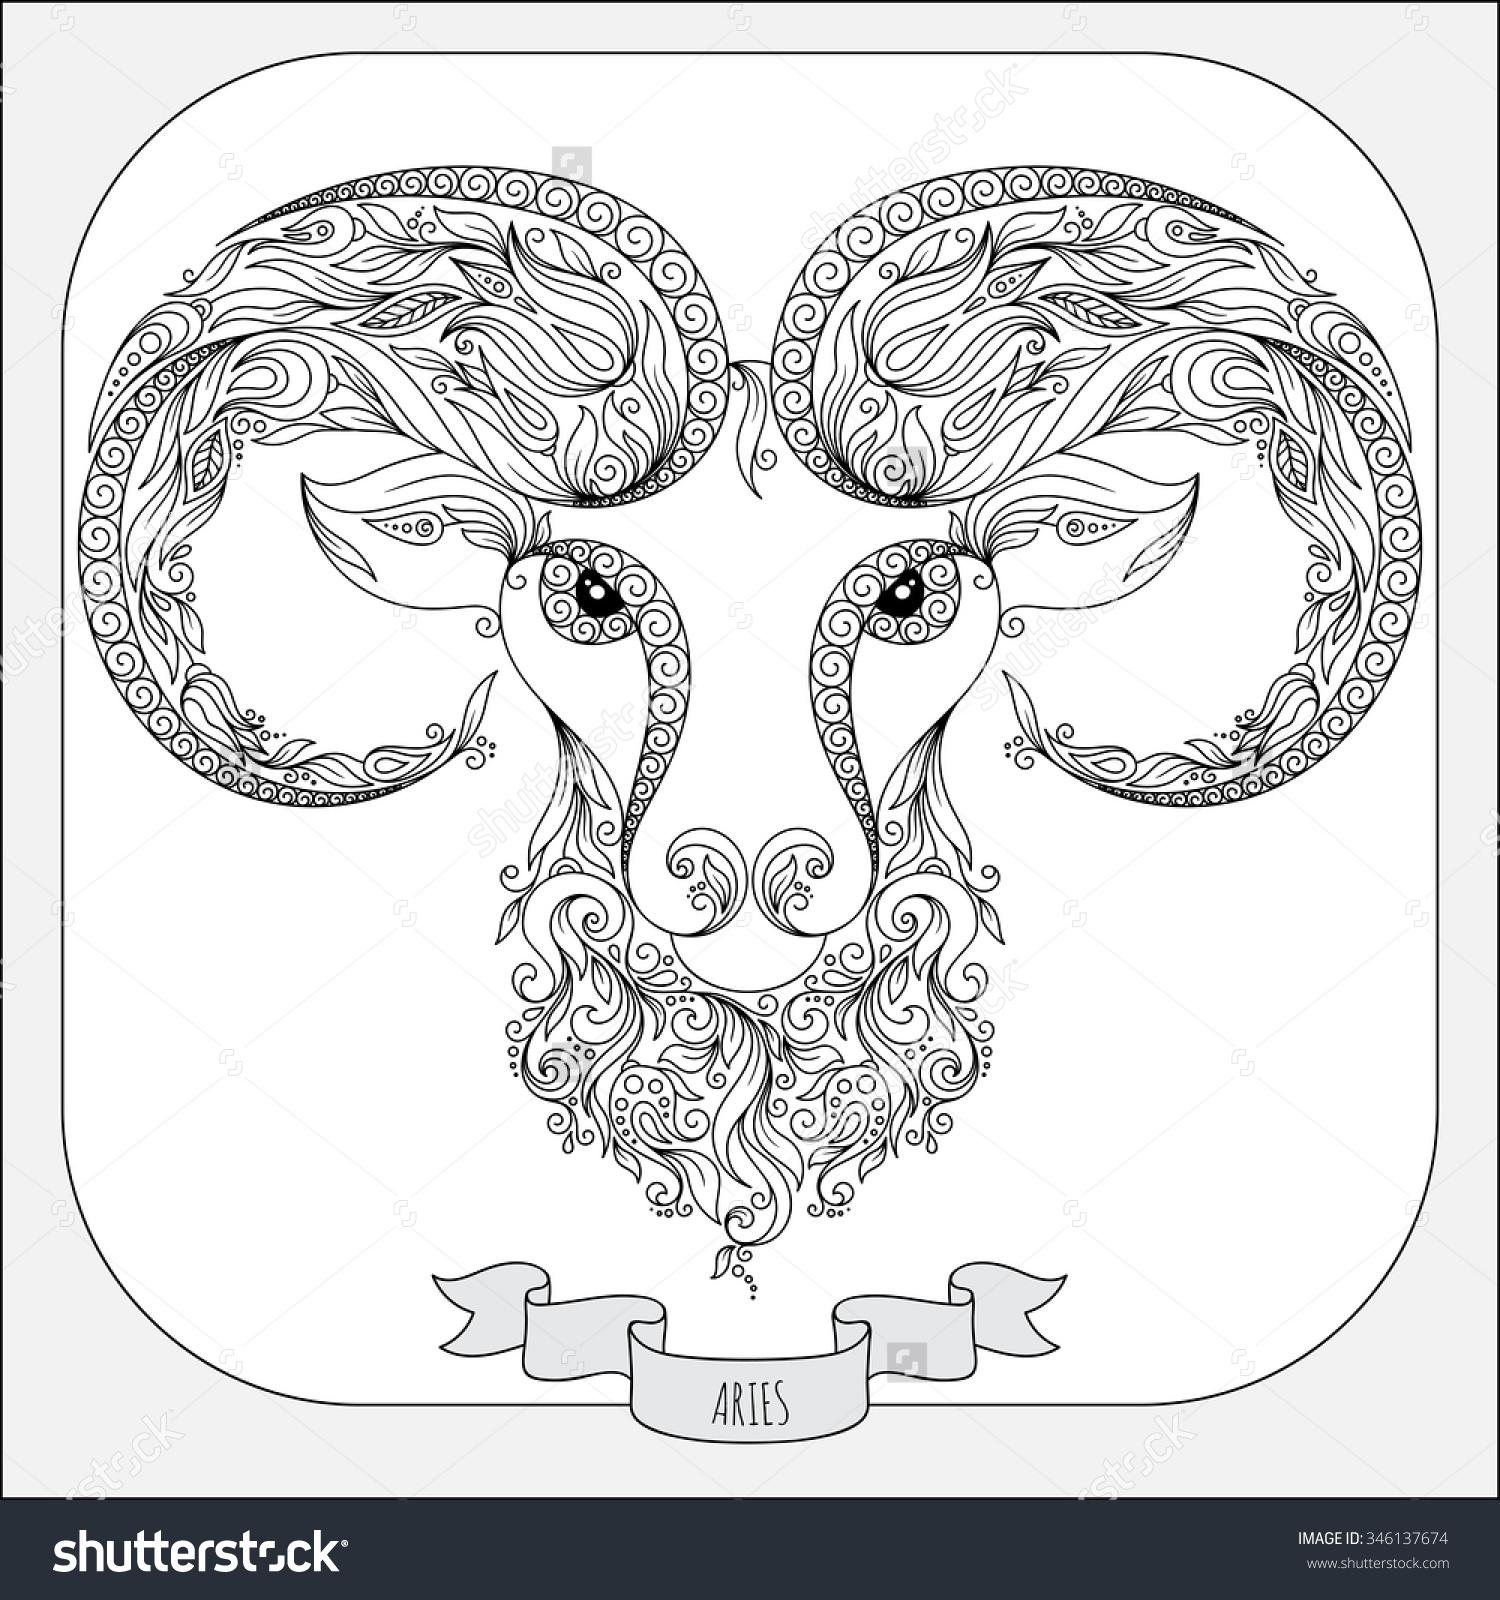 Aries coloring #12, Download drawings